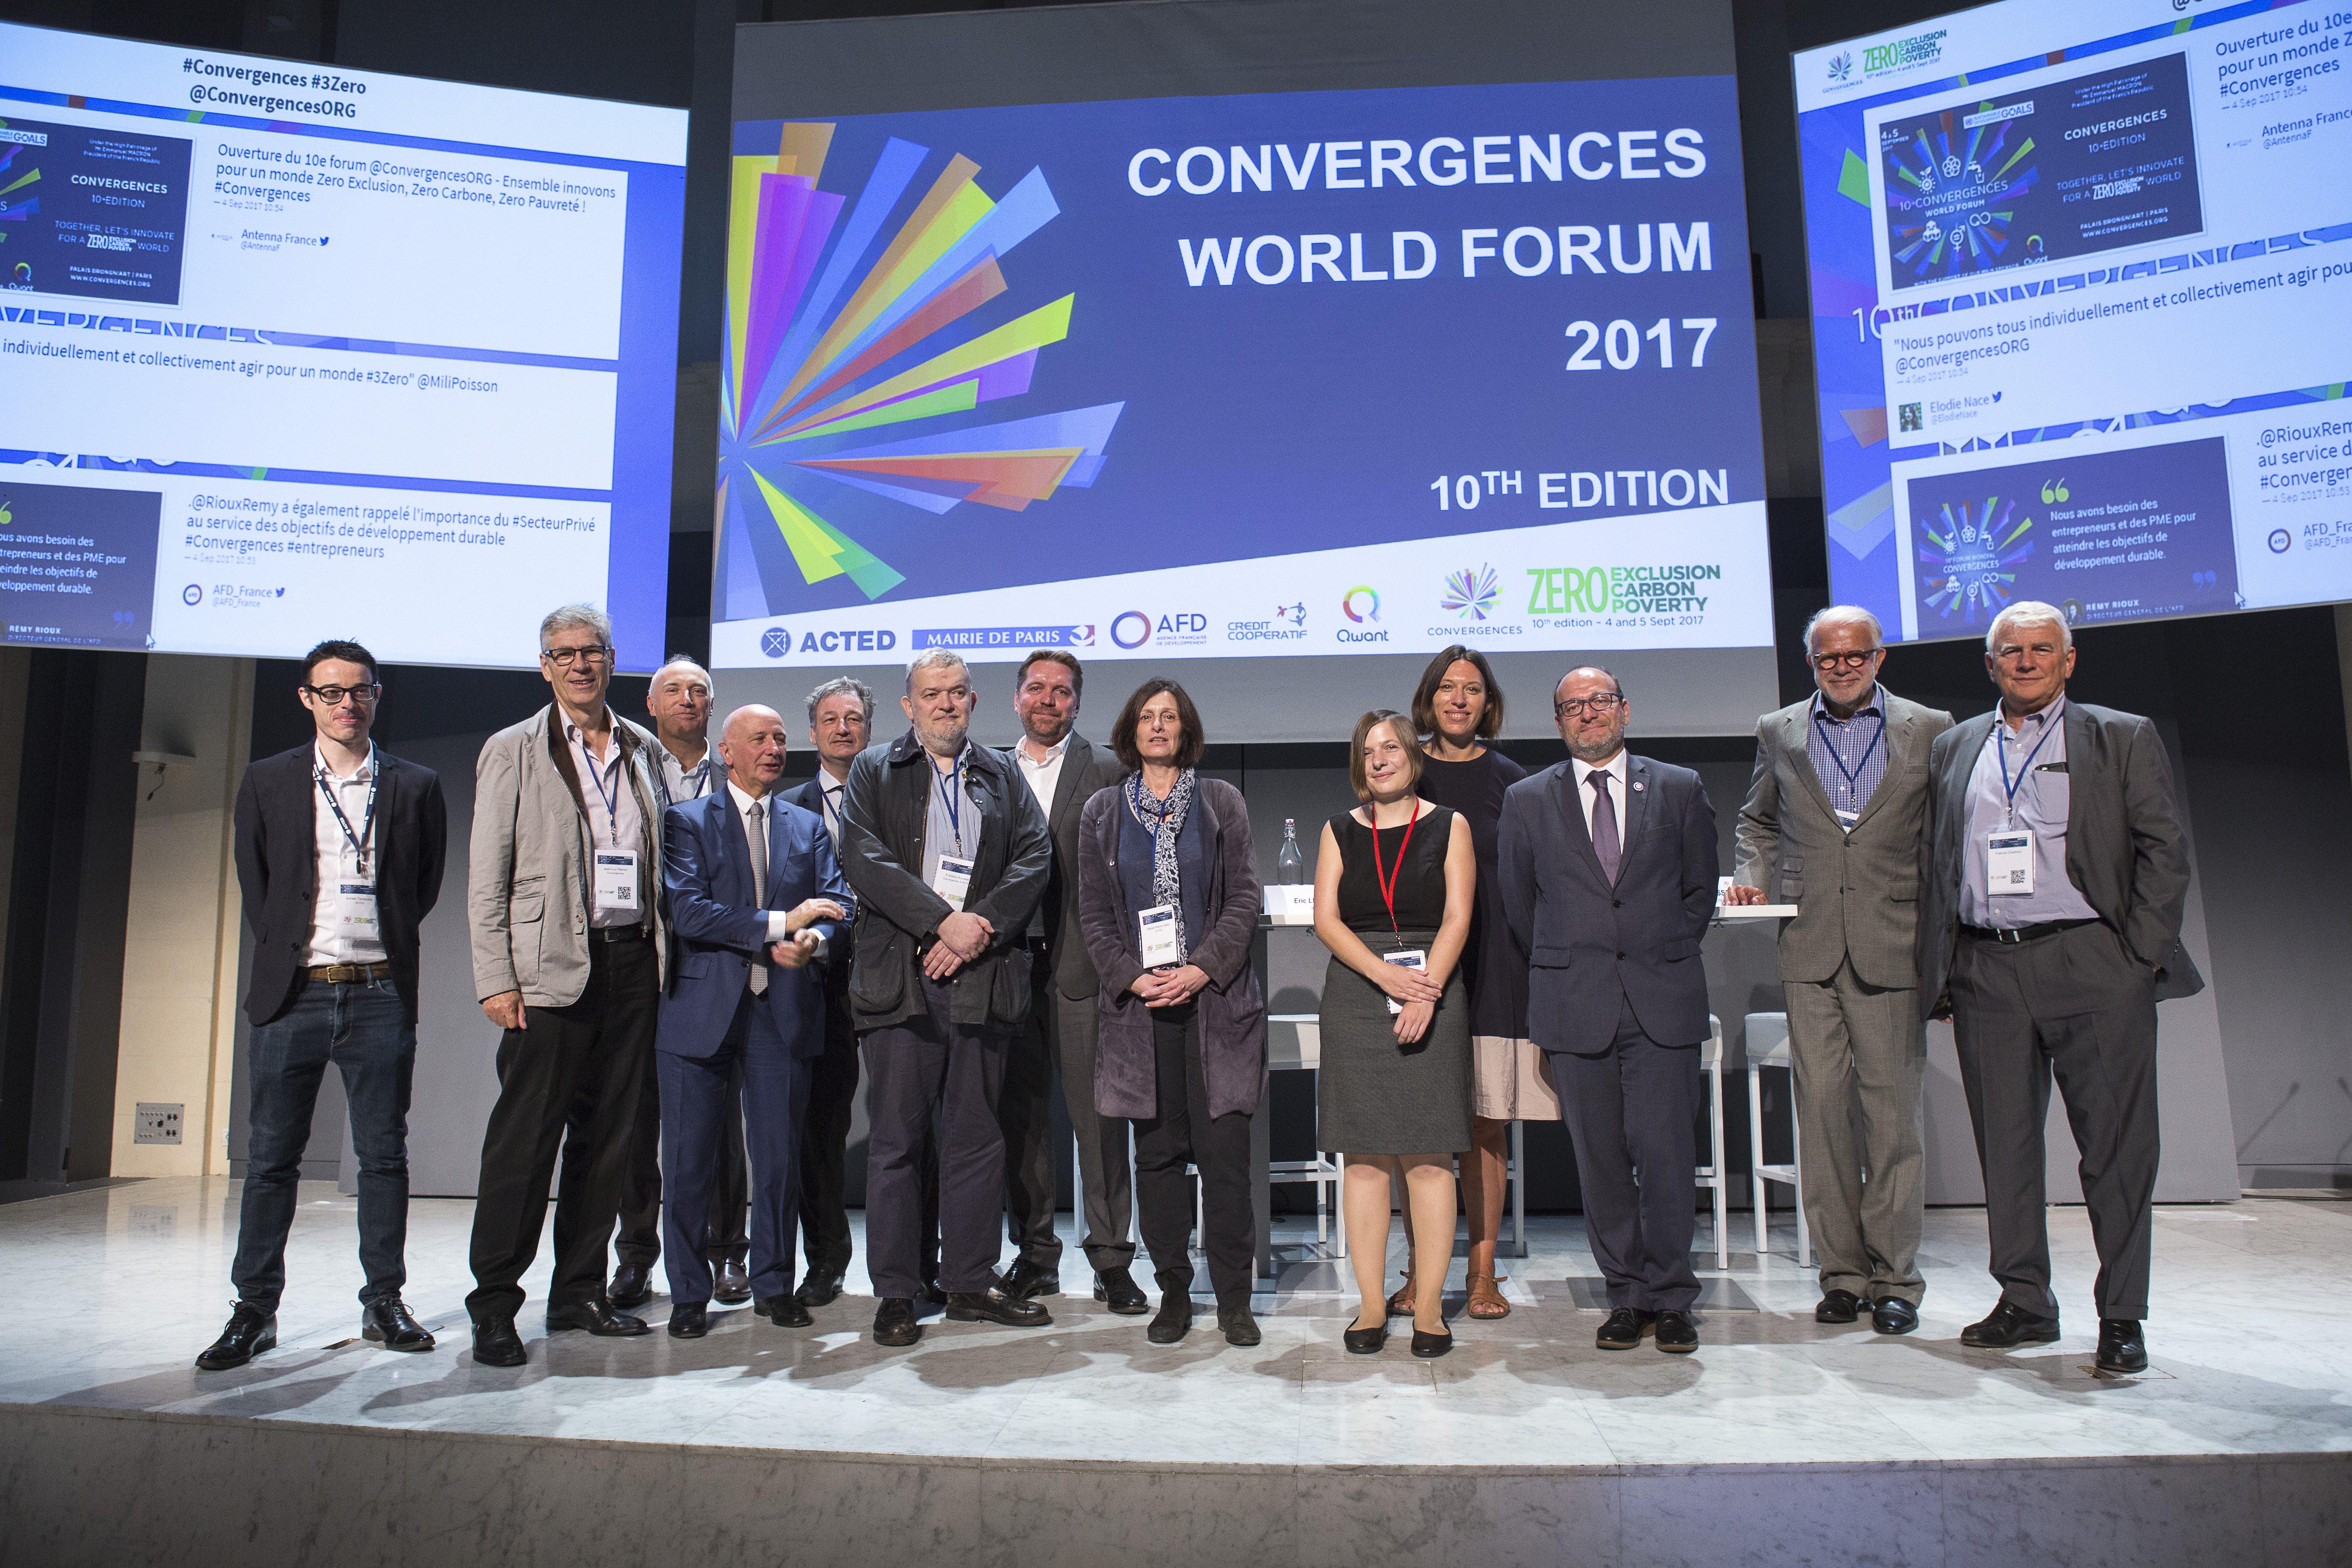 YC_CONVERGENCES2017_J1_20